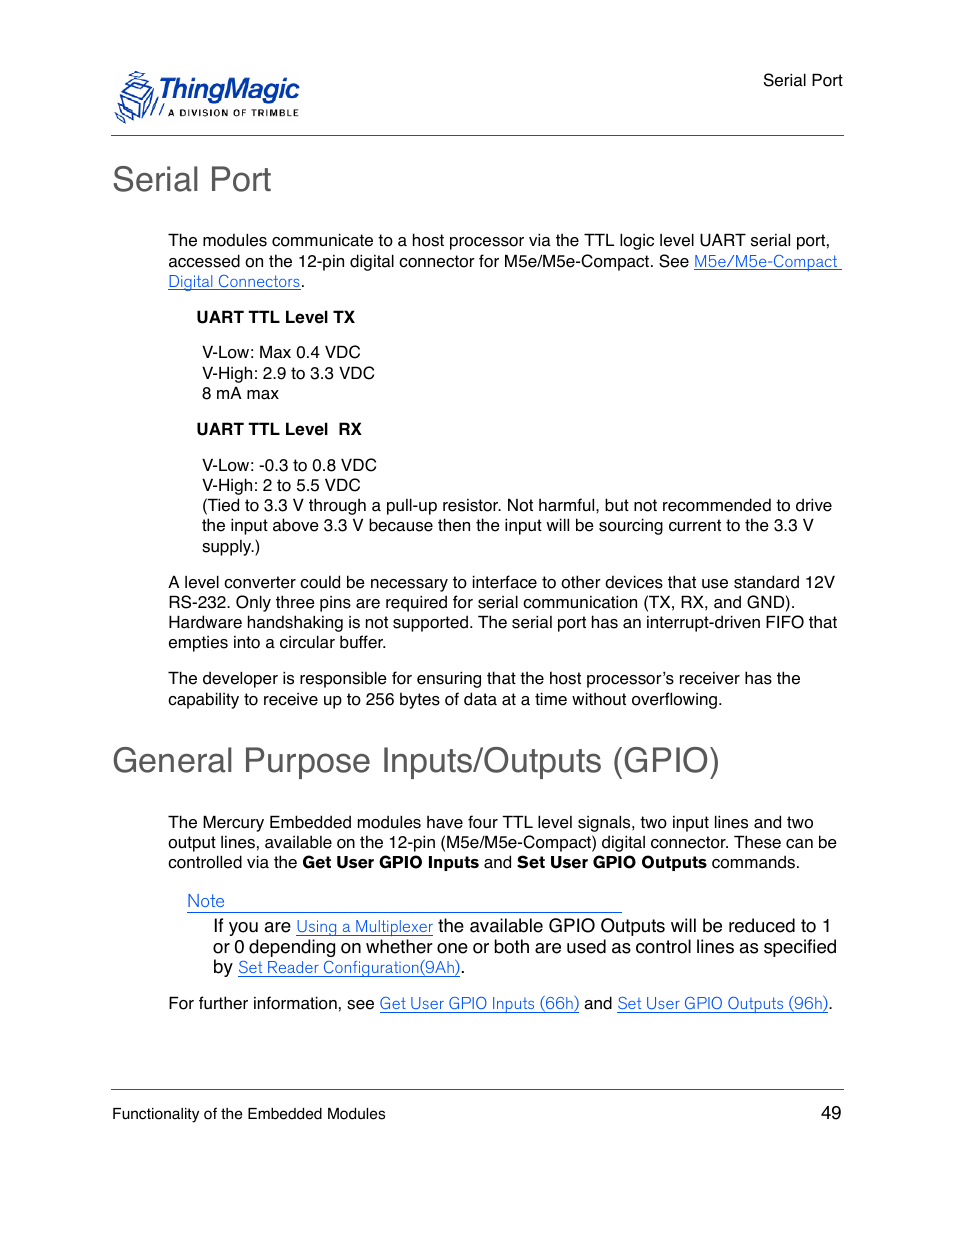 Serial port, General purpose inputs/outputs (gpio